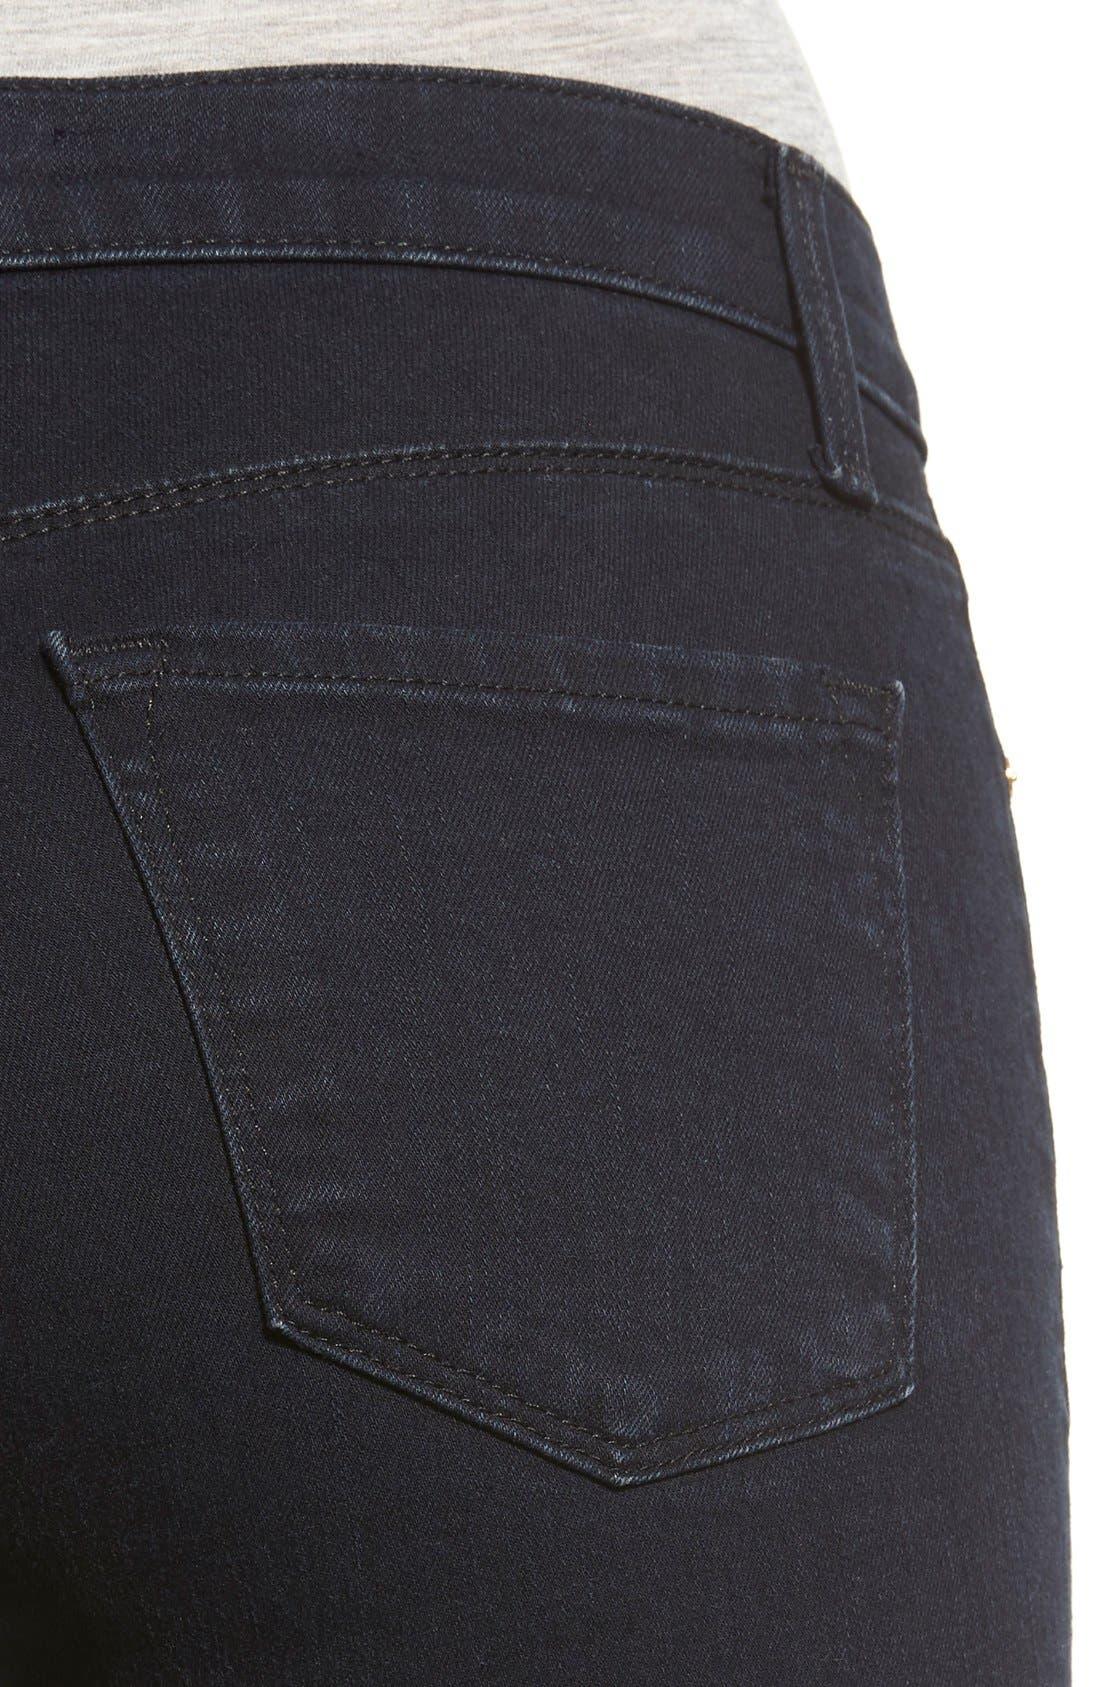 8227 Destroyed Crop Skinny Ankle Jeans,                             Alternate thumbnail 9, color,                             407